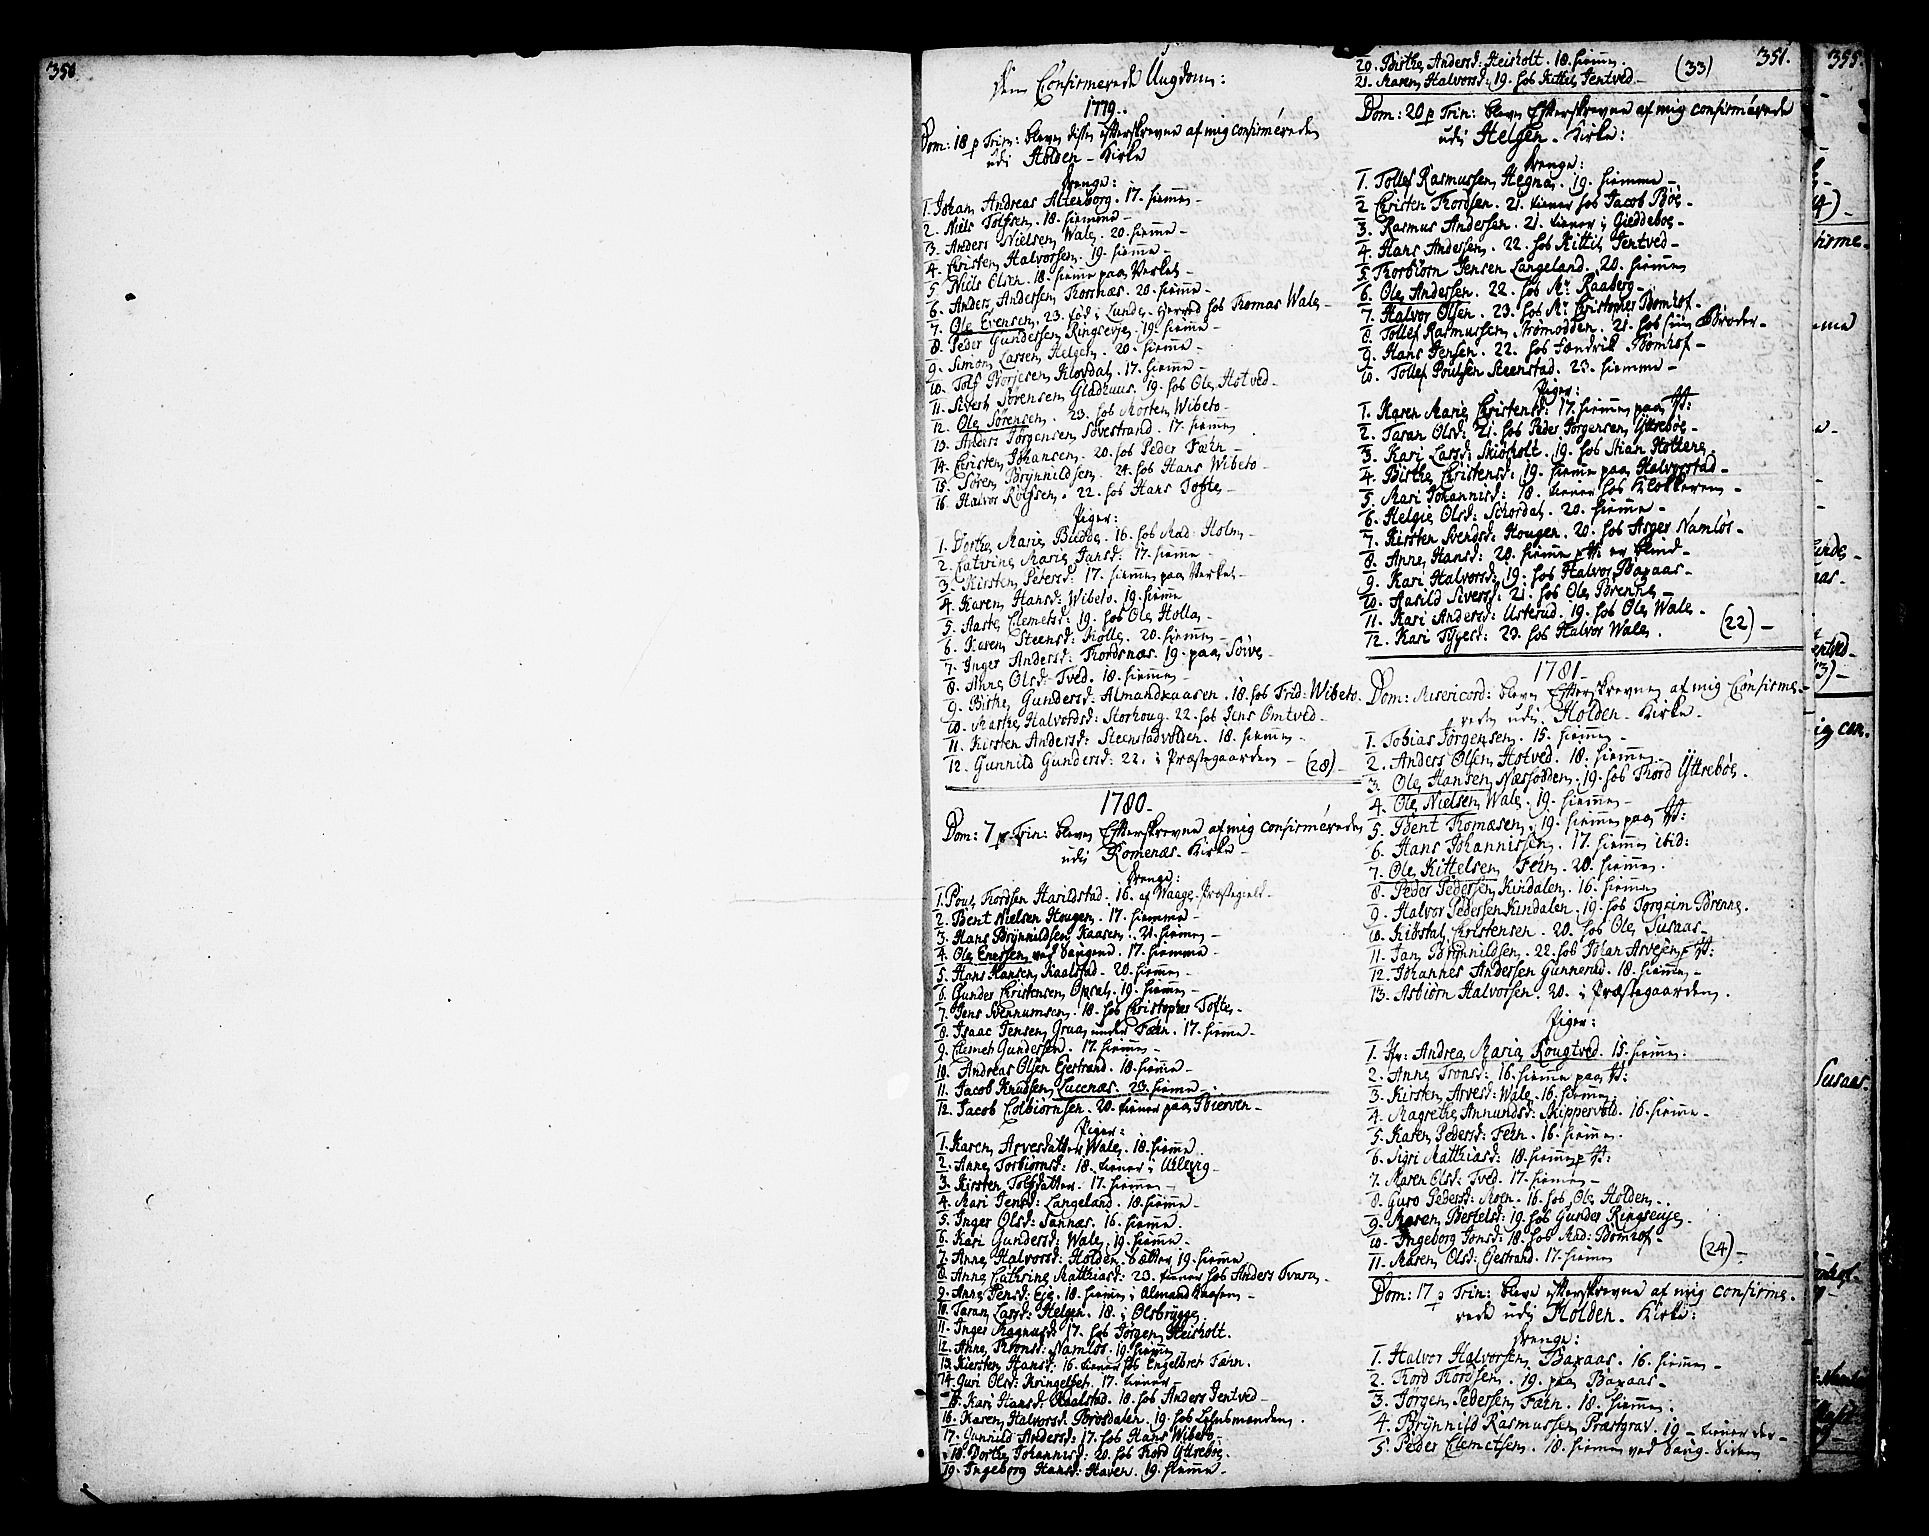 SAKO, Holla kirkebøker, F/Fa/L0002: Ministerialbok nr. 2, 1779-1814, s. 350-351